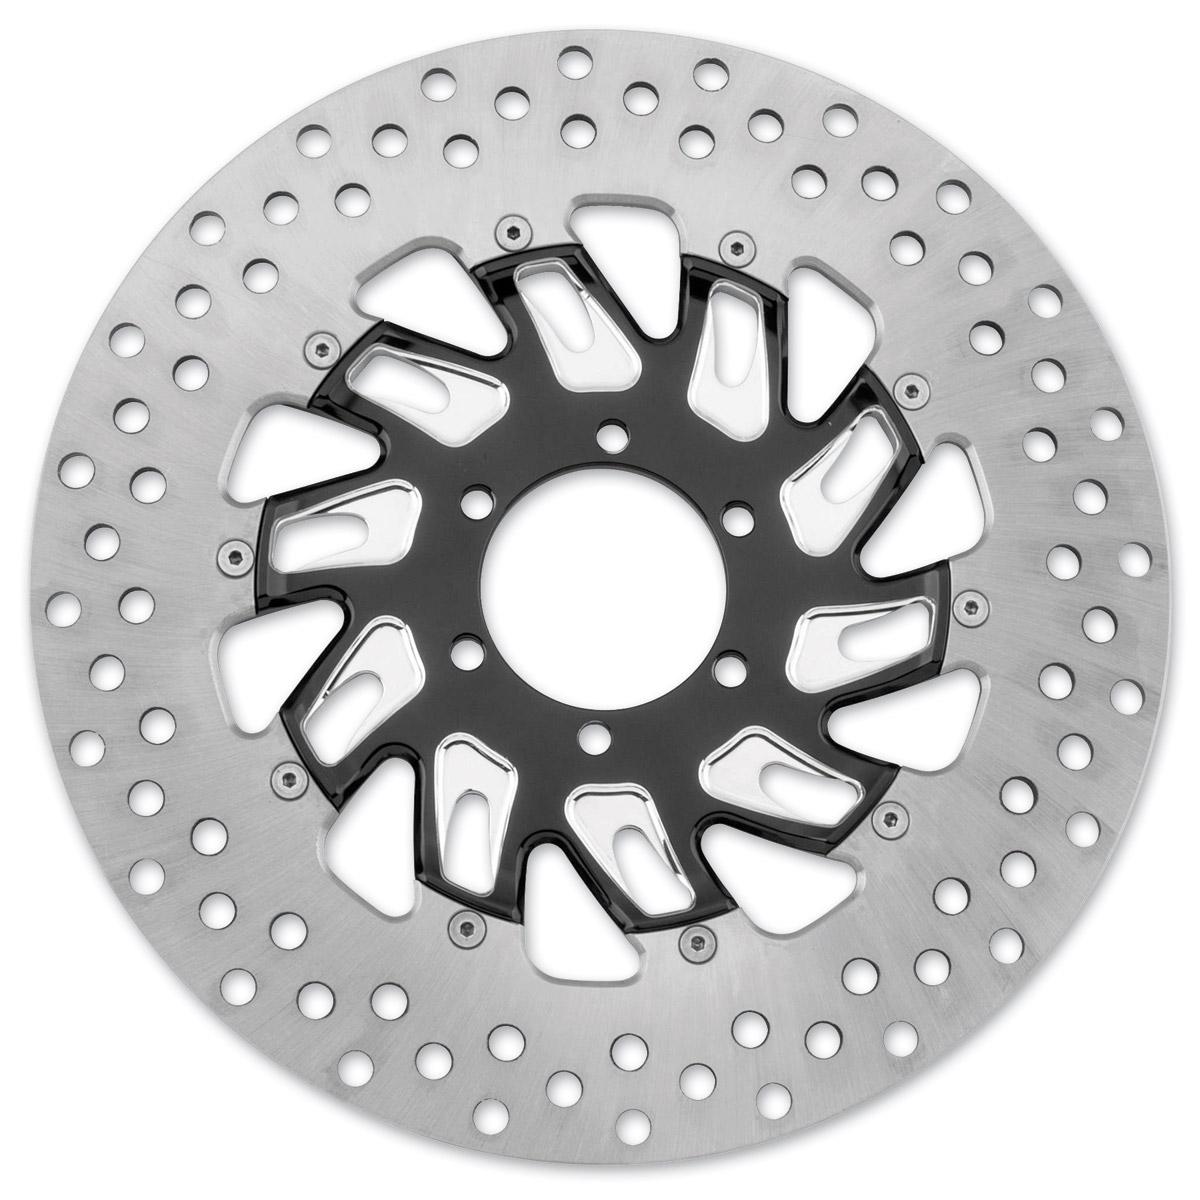 Performance Machine 11.8″ Supra Contrast Cut Platinum Front Right Brake Rotor